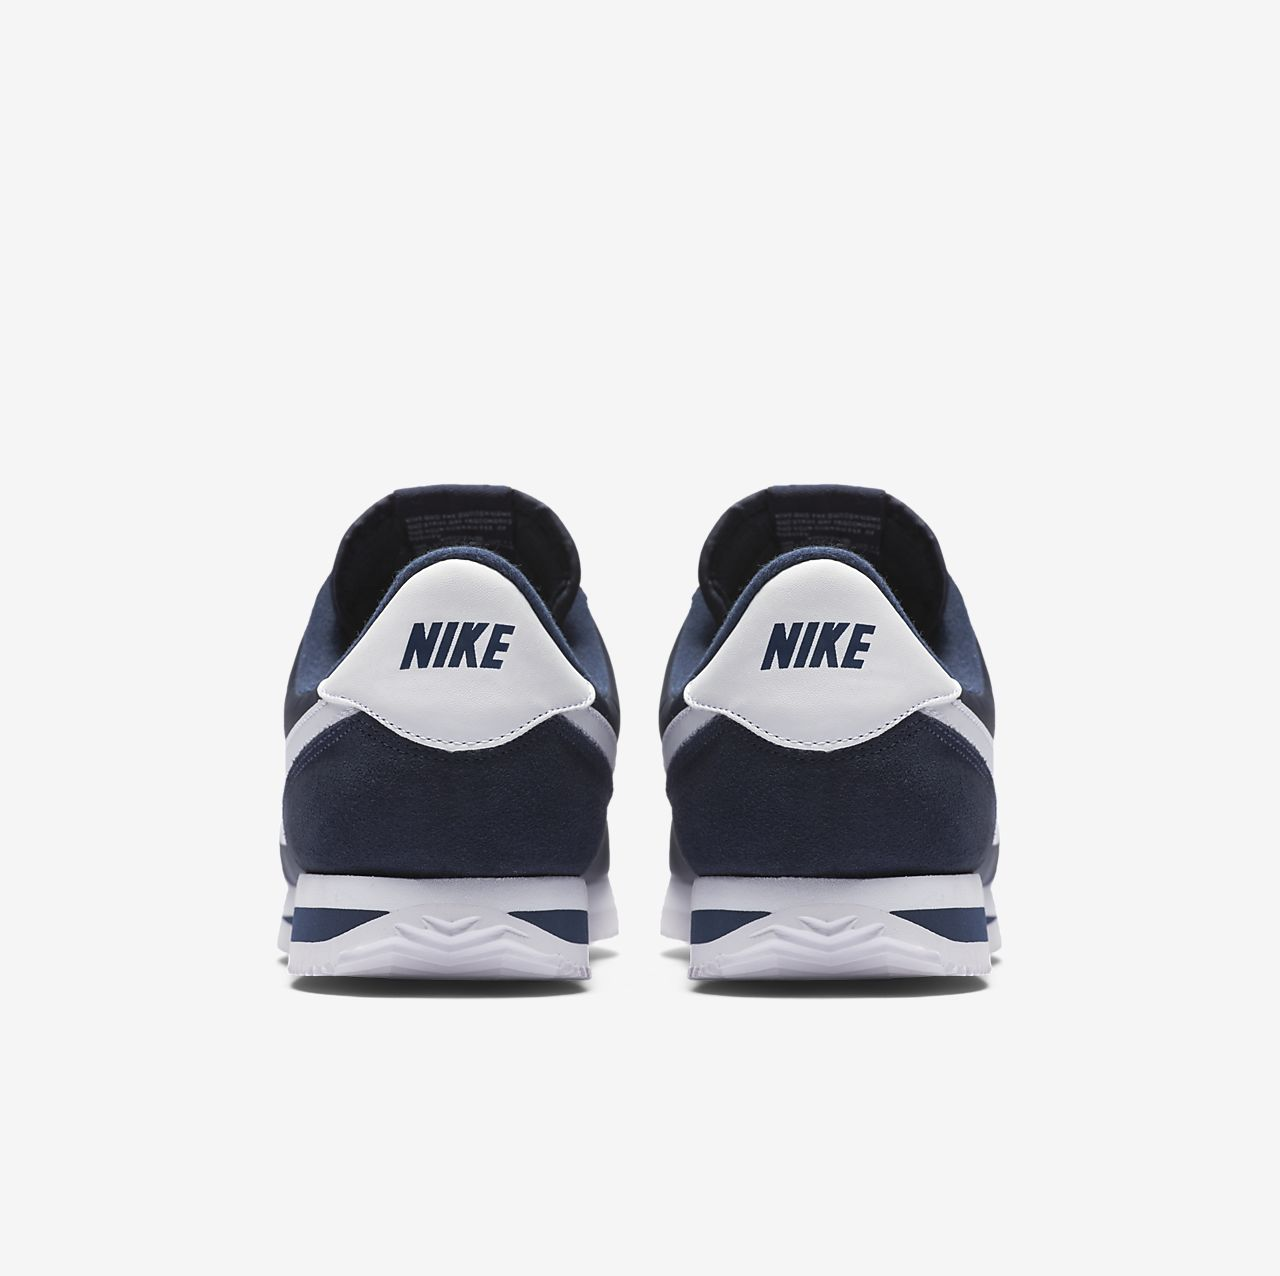 new styles 530e2 7c2f7 ... Nike Cortez Basic Nylon Men s Shoe